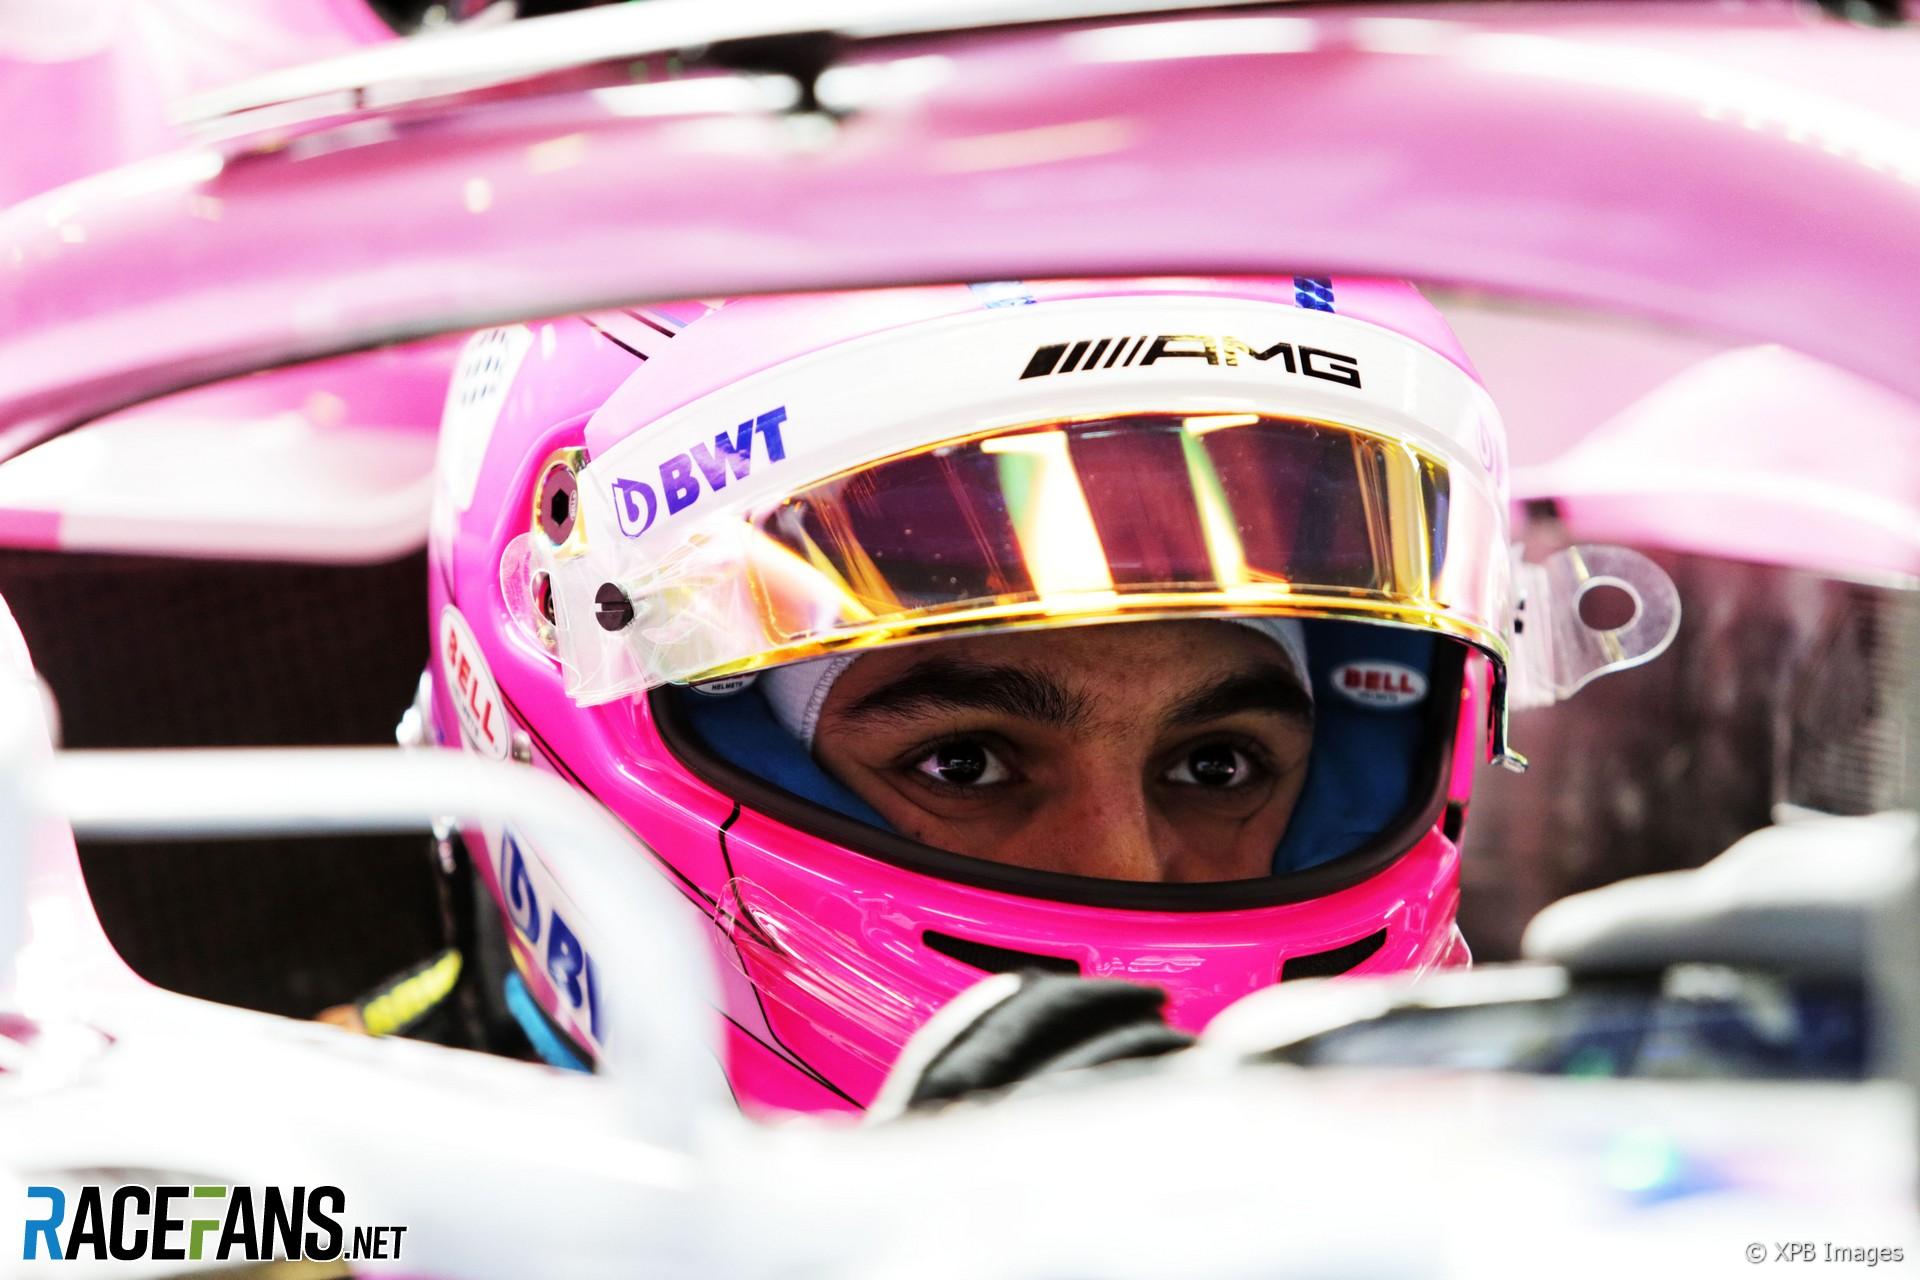 Esteban Ocon, Force India, Circuit de Catalunya, 2018